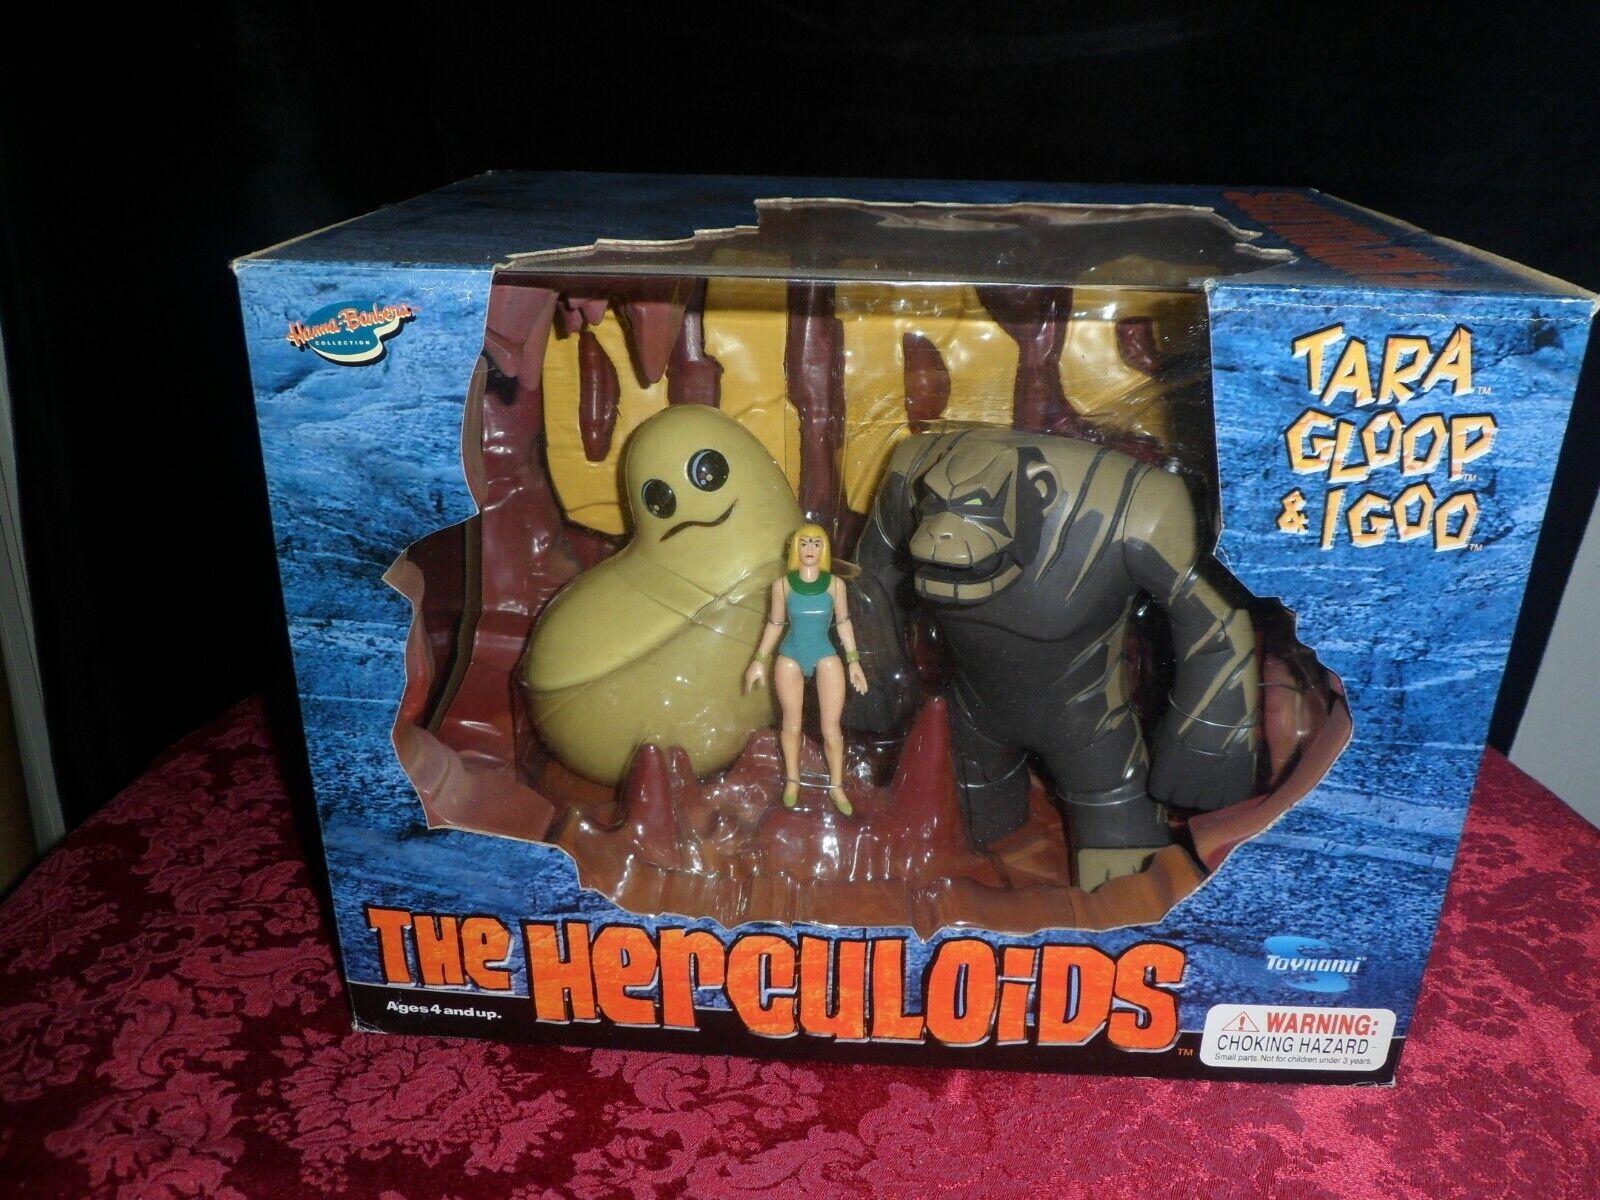 The Herculoids Tara, Gloop and Igoo by Toynami